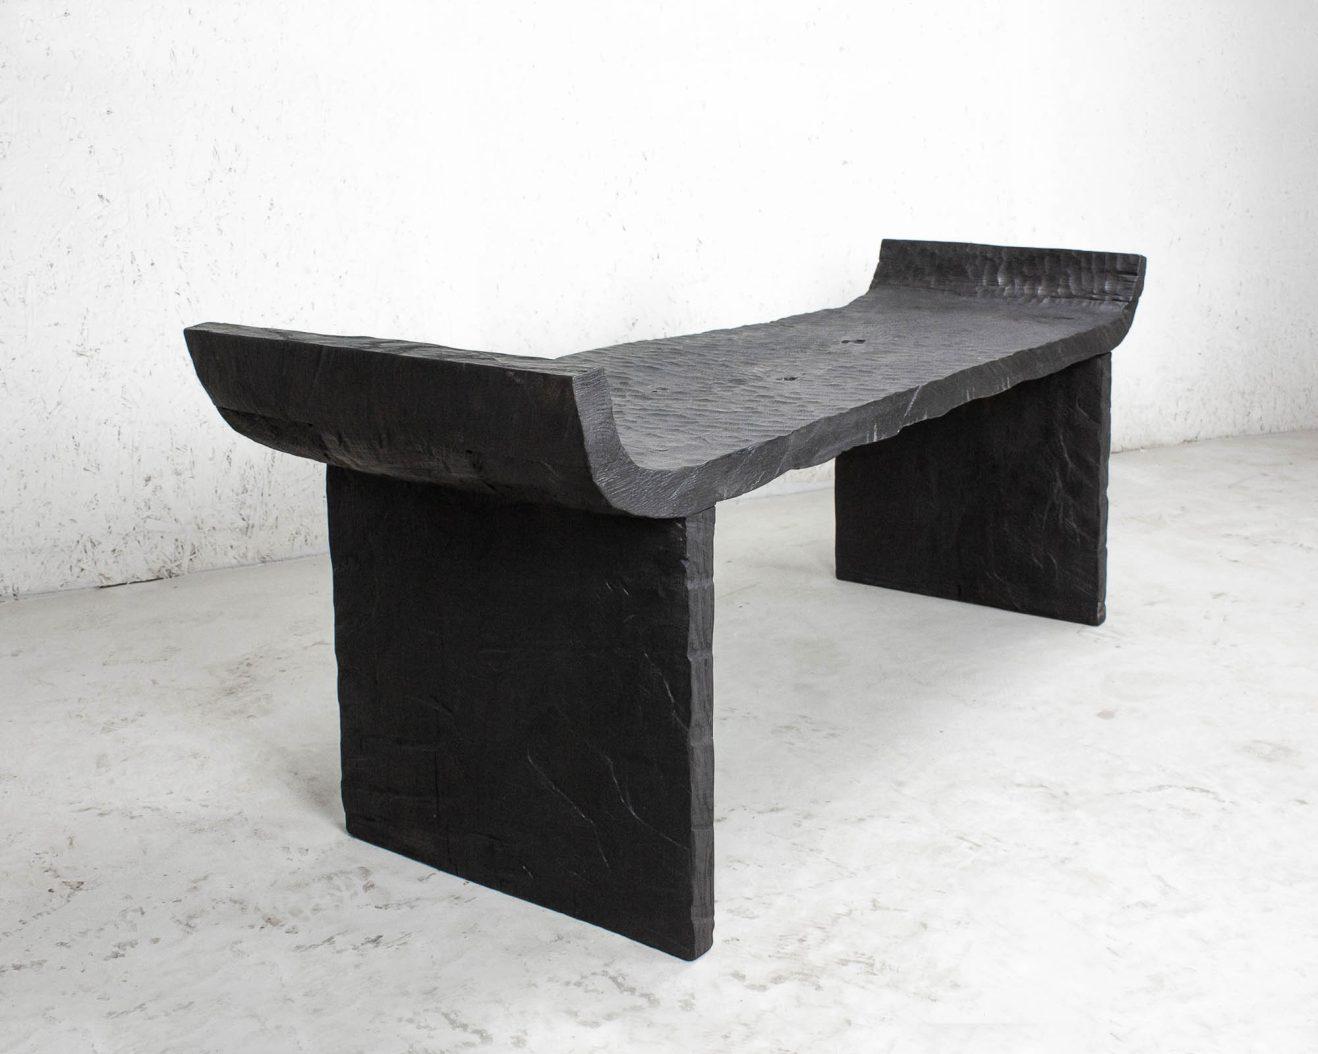 Soha-Bench-Antique-Dark-2